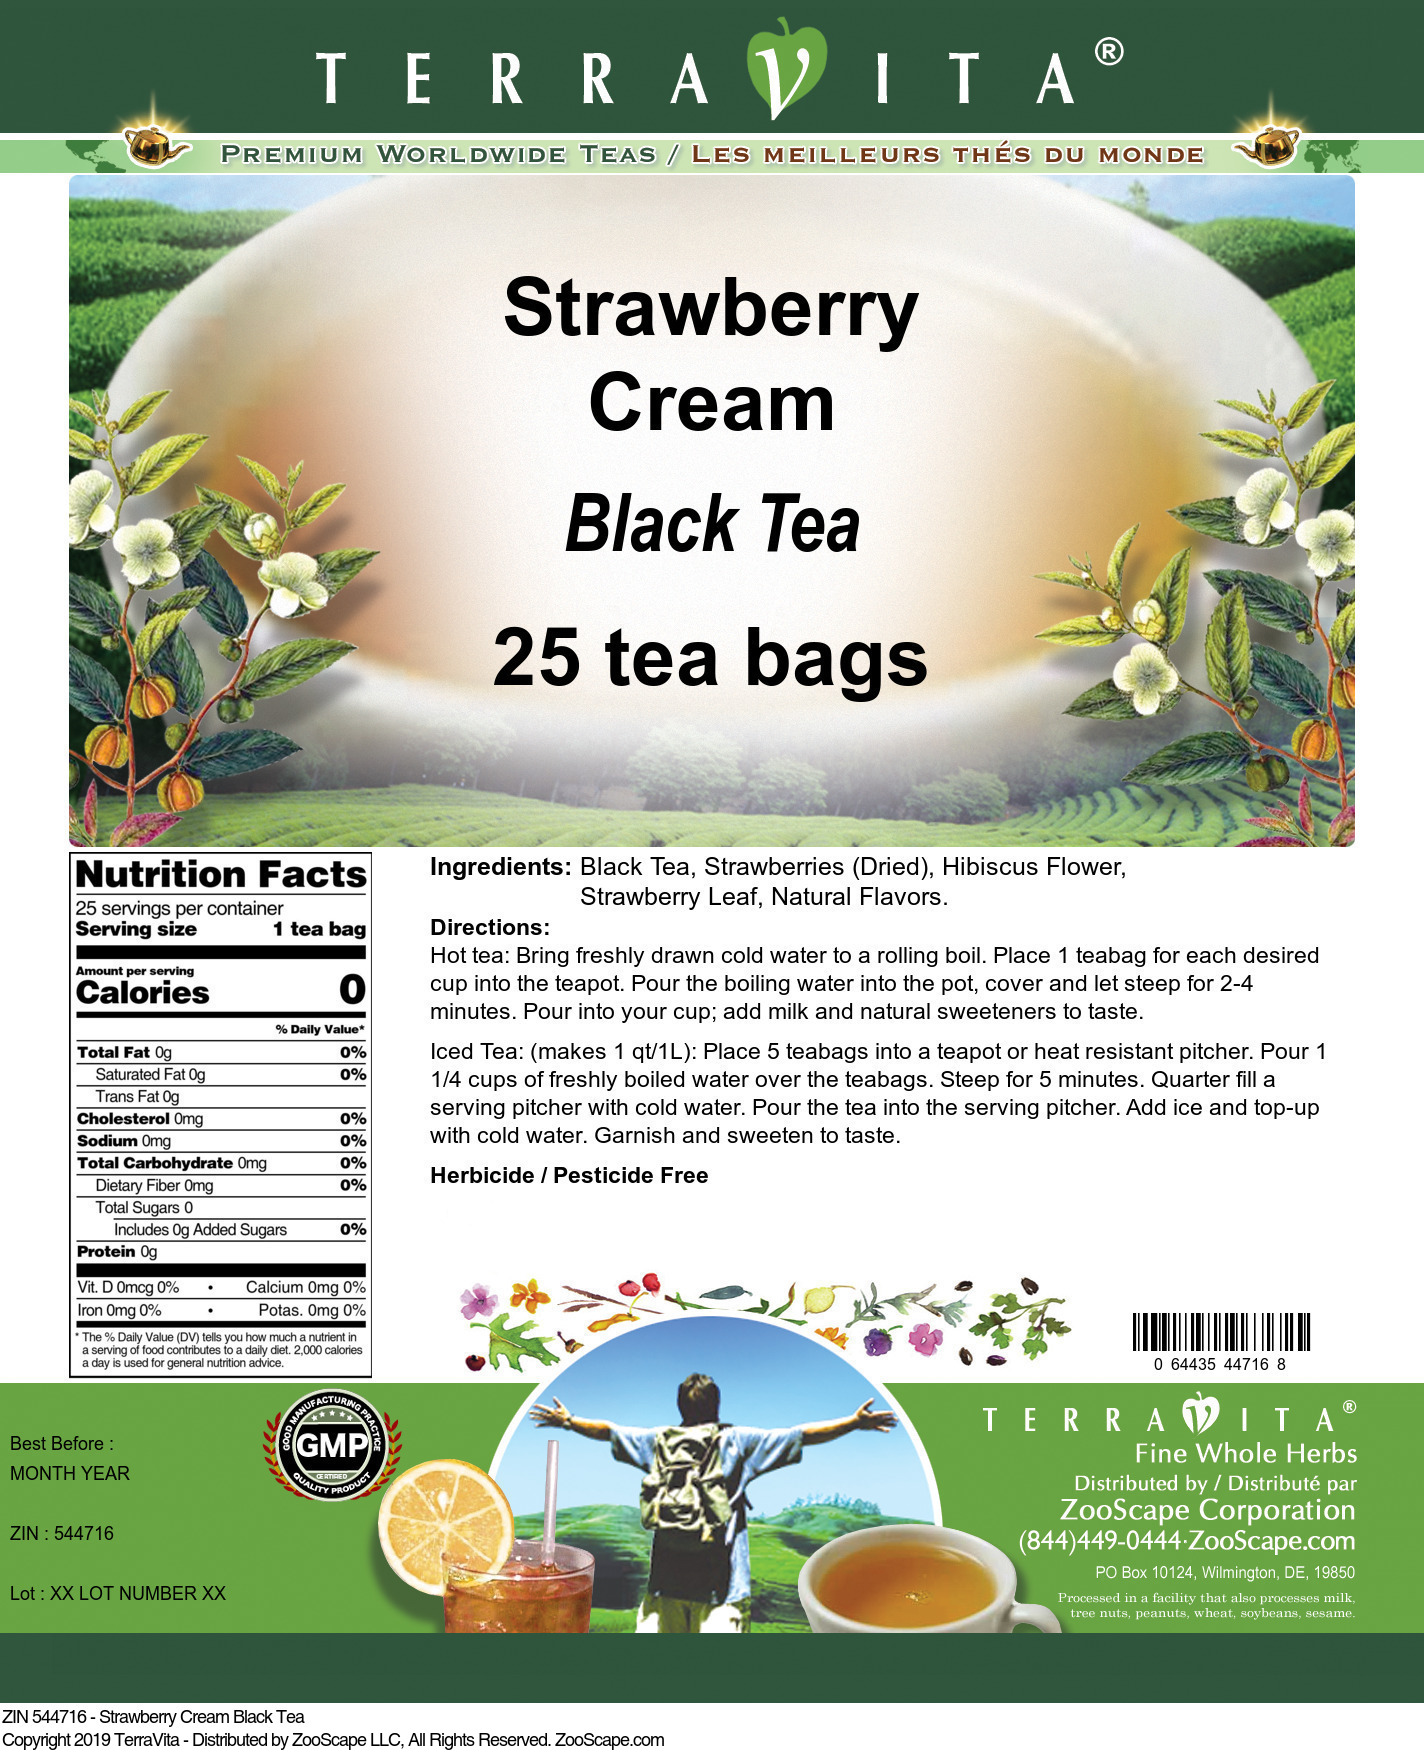 Strawberry Cream Black Tea